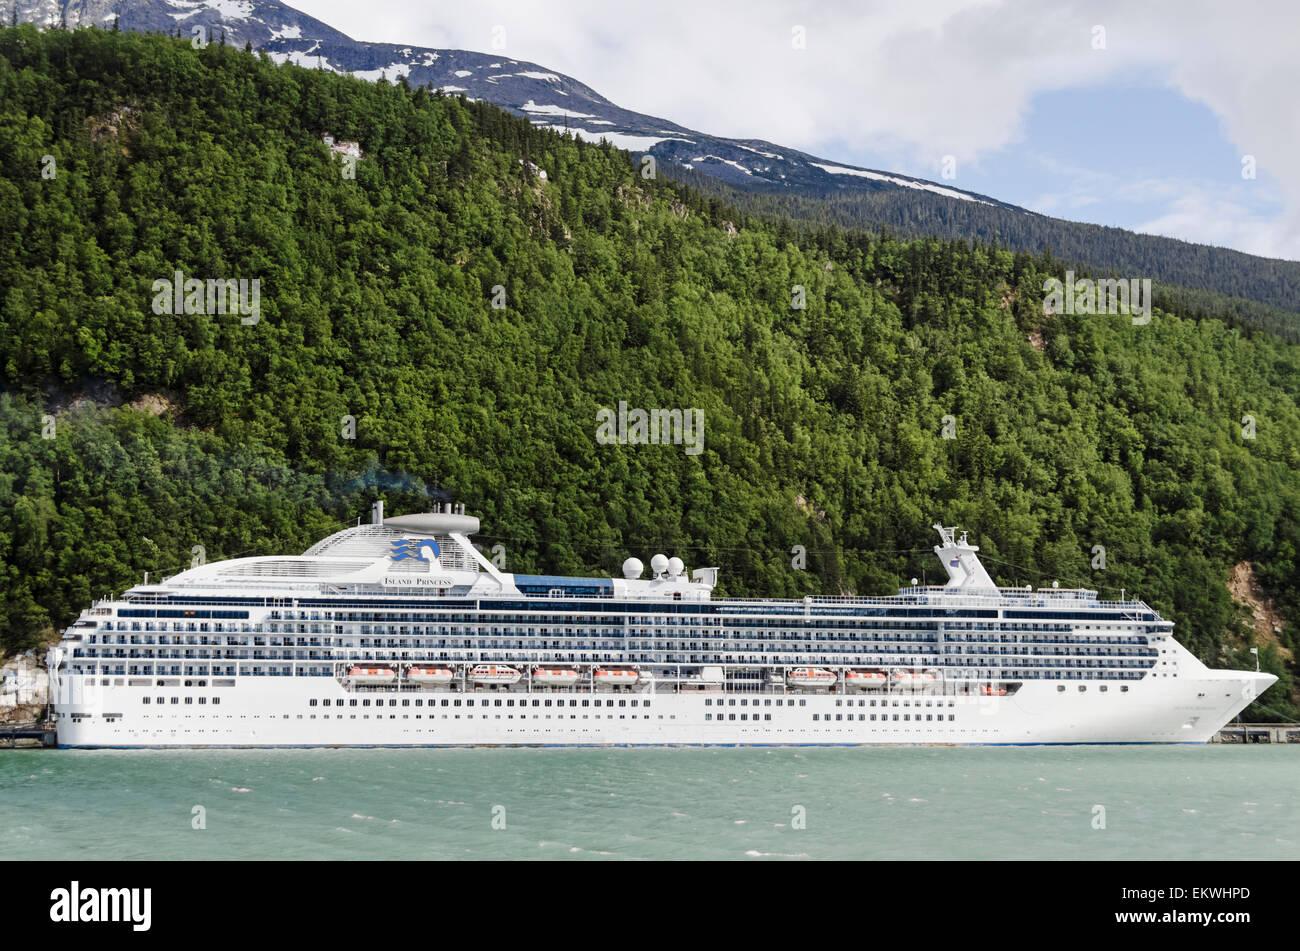 Cruise Ship Island Princess belonging to Princess Cruises tied up to Railroad Dock in Skagway Alaska - Stock Image